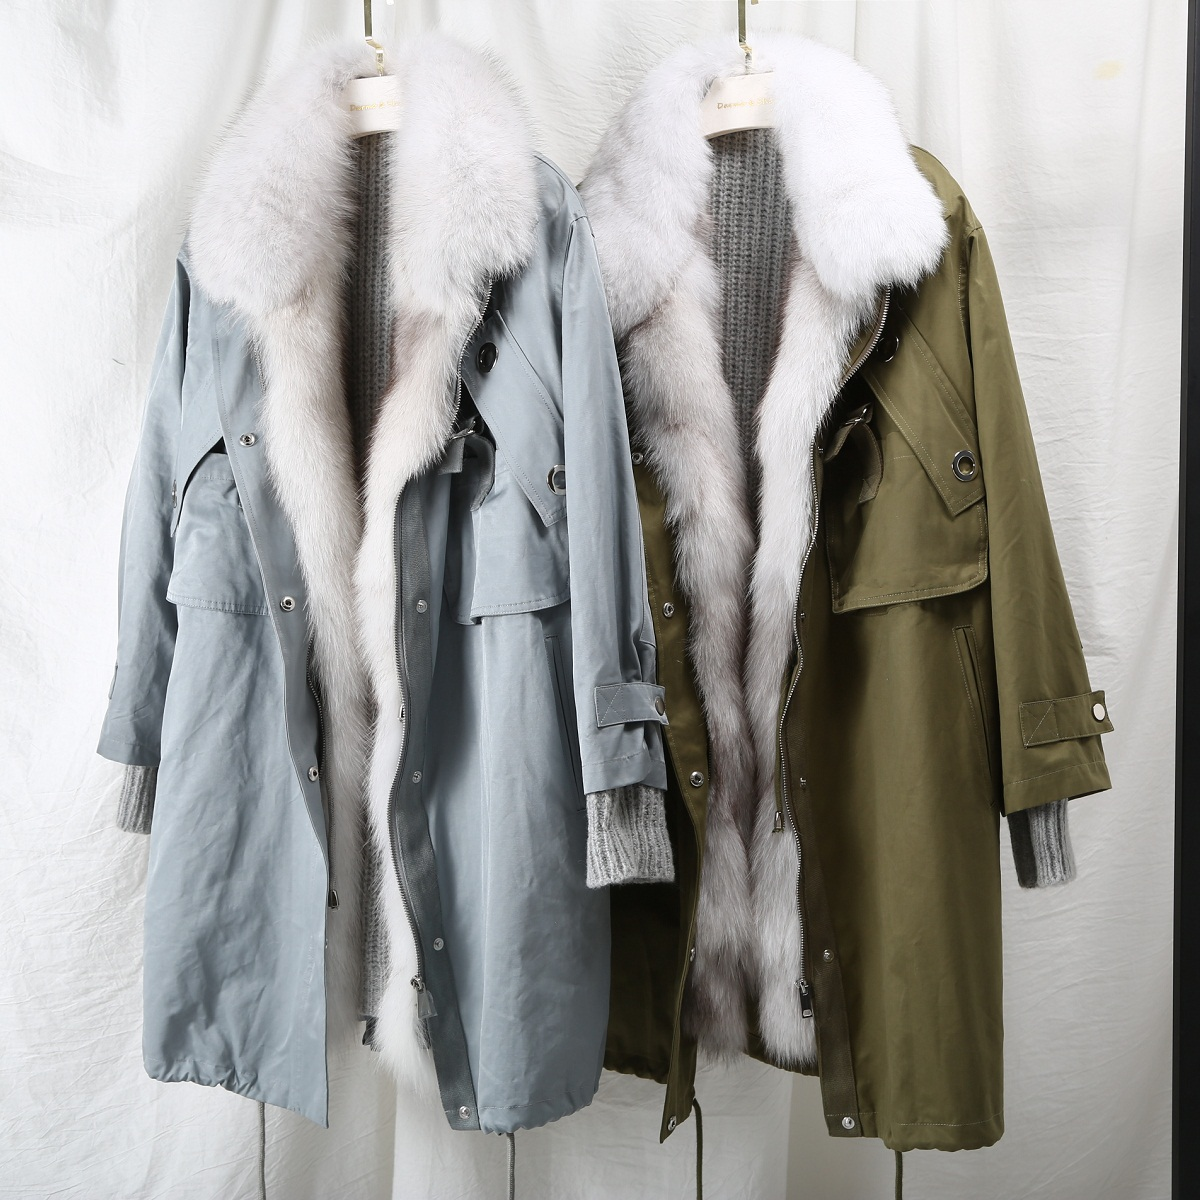 Sweater Splice Real Fox Fur Women's Winter Parkas Middle Long Plus Size Real Fur Coat Korean Women Clothes 2018 New